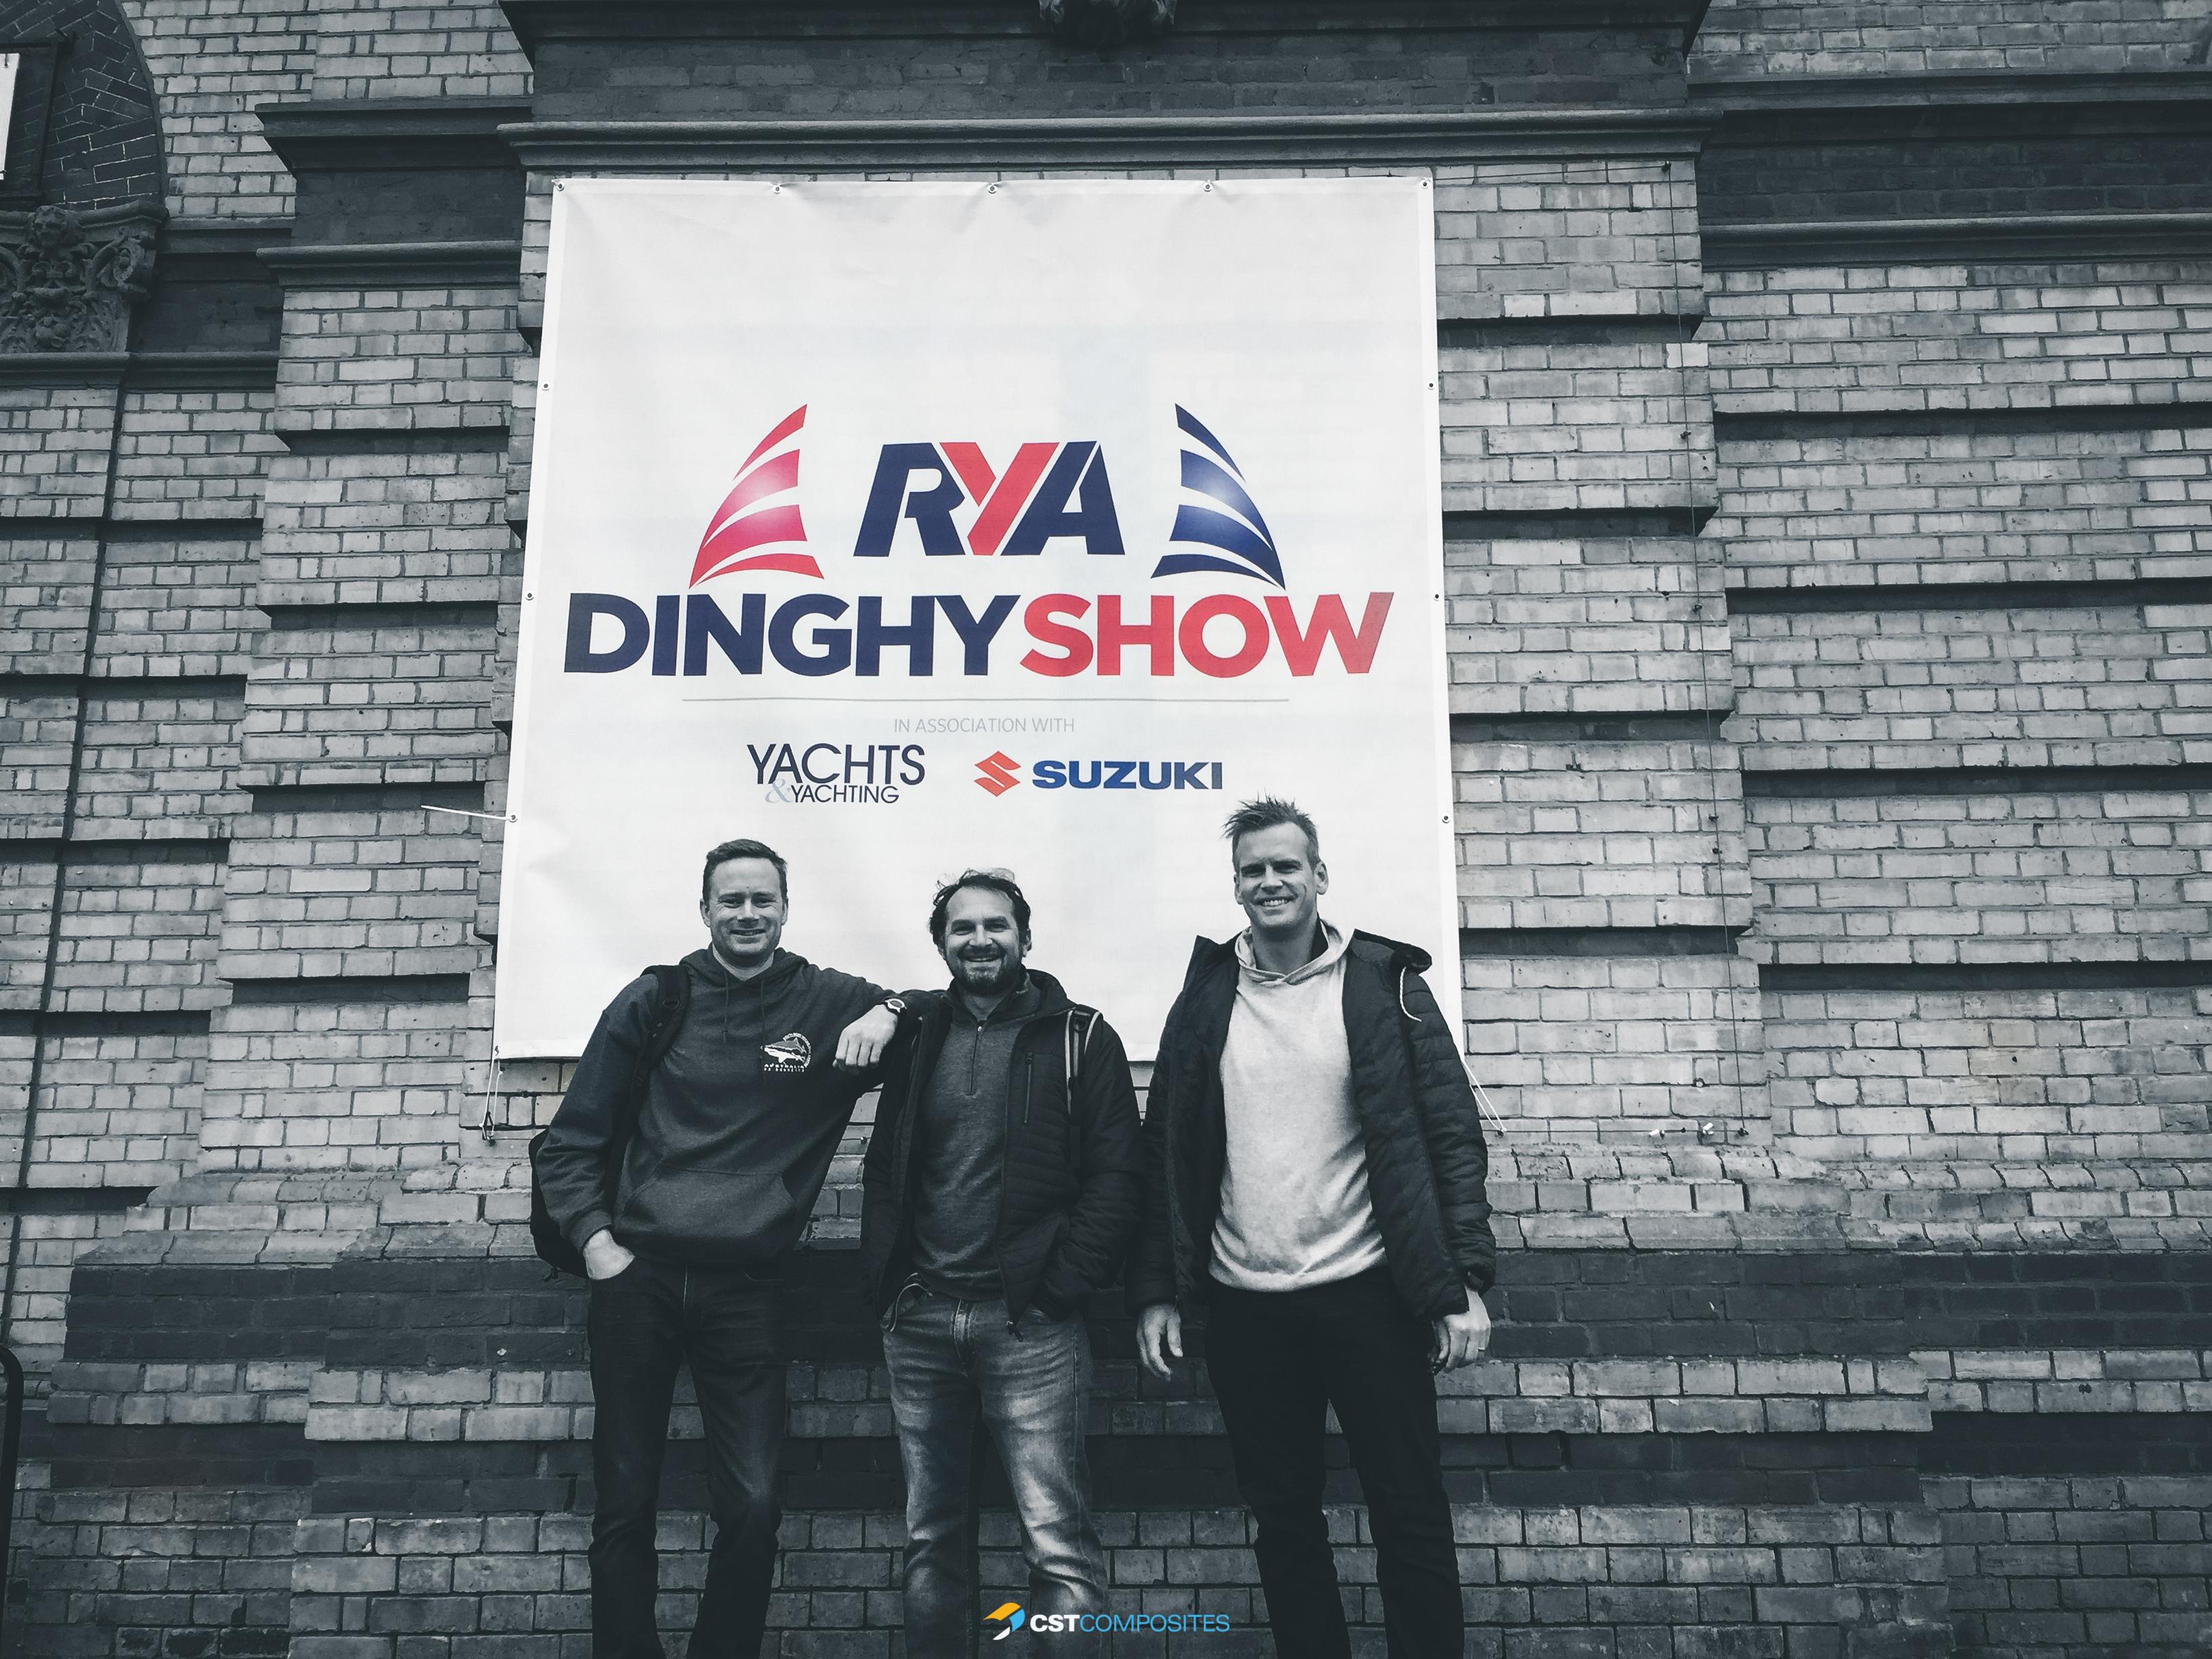 2019 RYA Dinghy Show